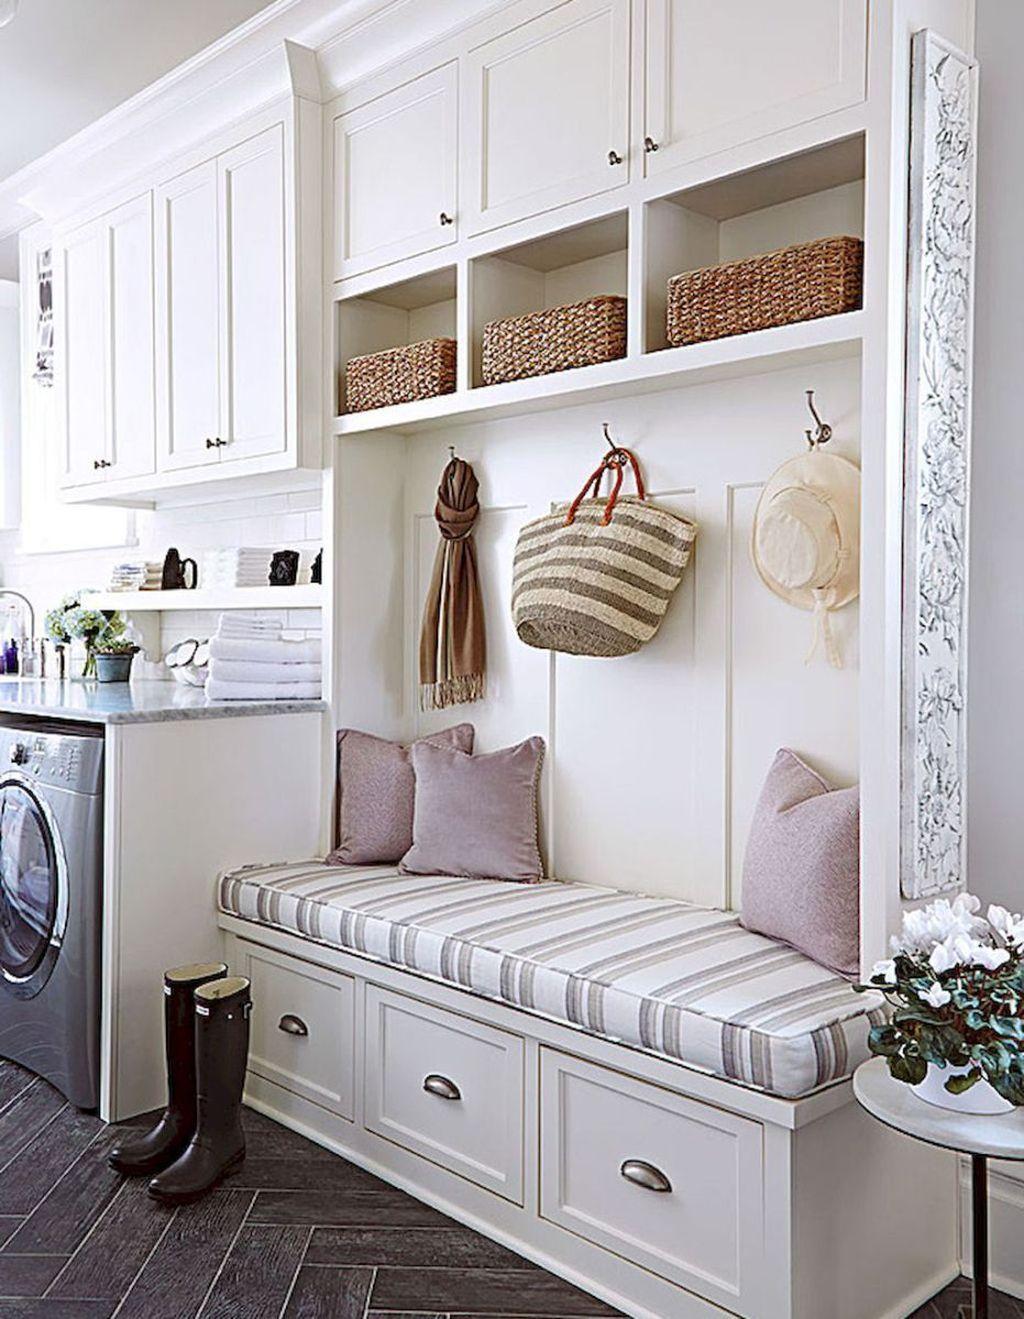 38 Inspiring Rustic Small Mudroom Bench Ideas Laundry Room Design Mudroom Laundry Room Home Decor